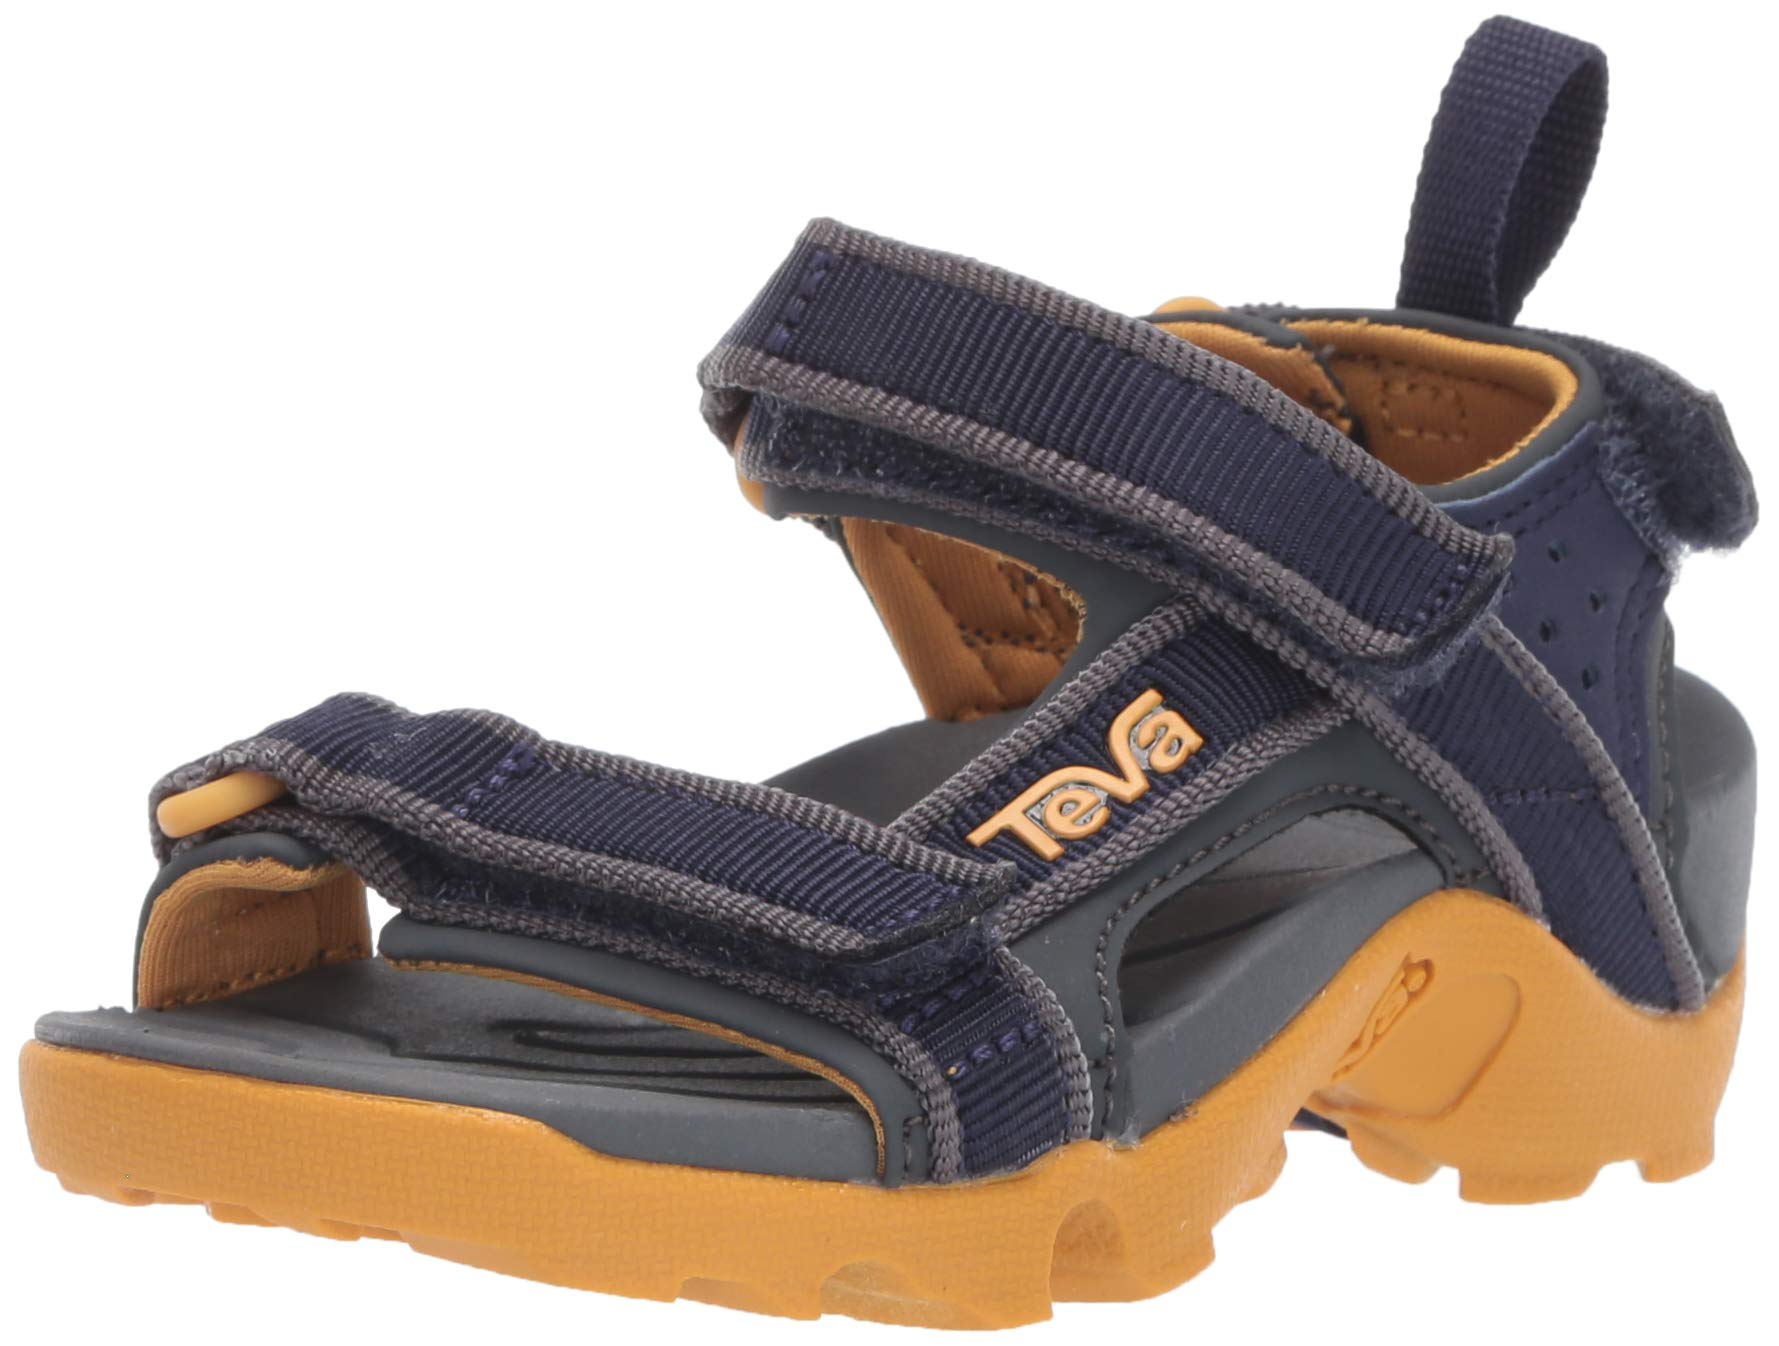 Teva Boys' T Tanza Sport Sandal Eclipse 10 Medium US Toddler by Teva